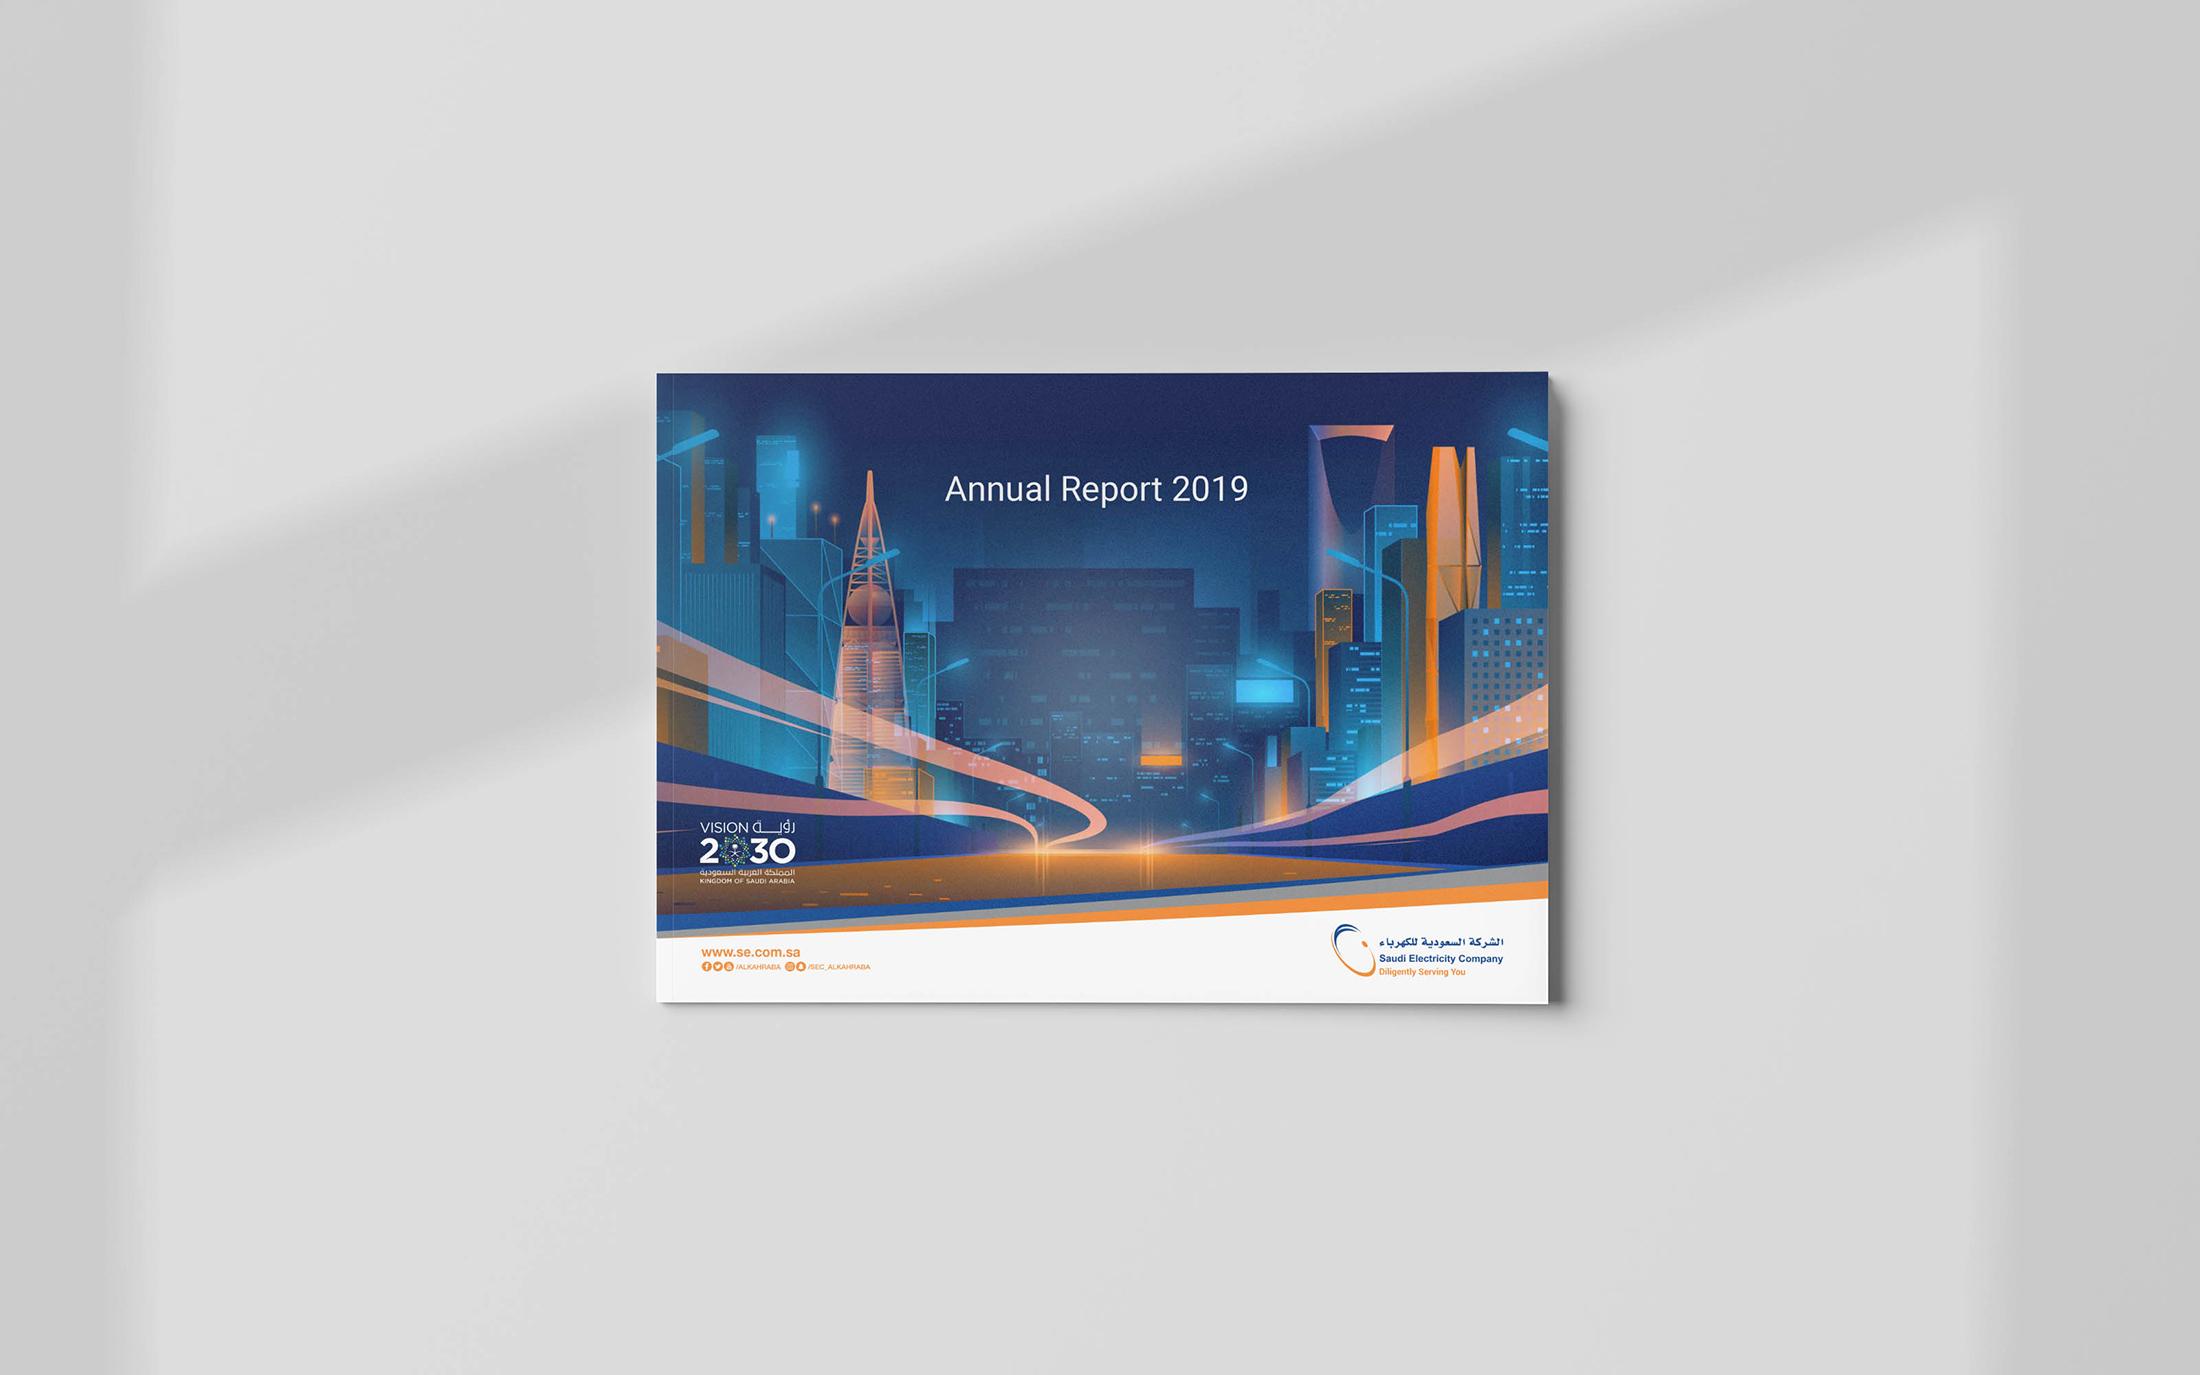 saudi electricity company Annual Report